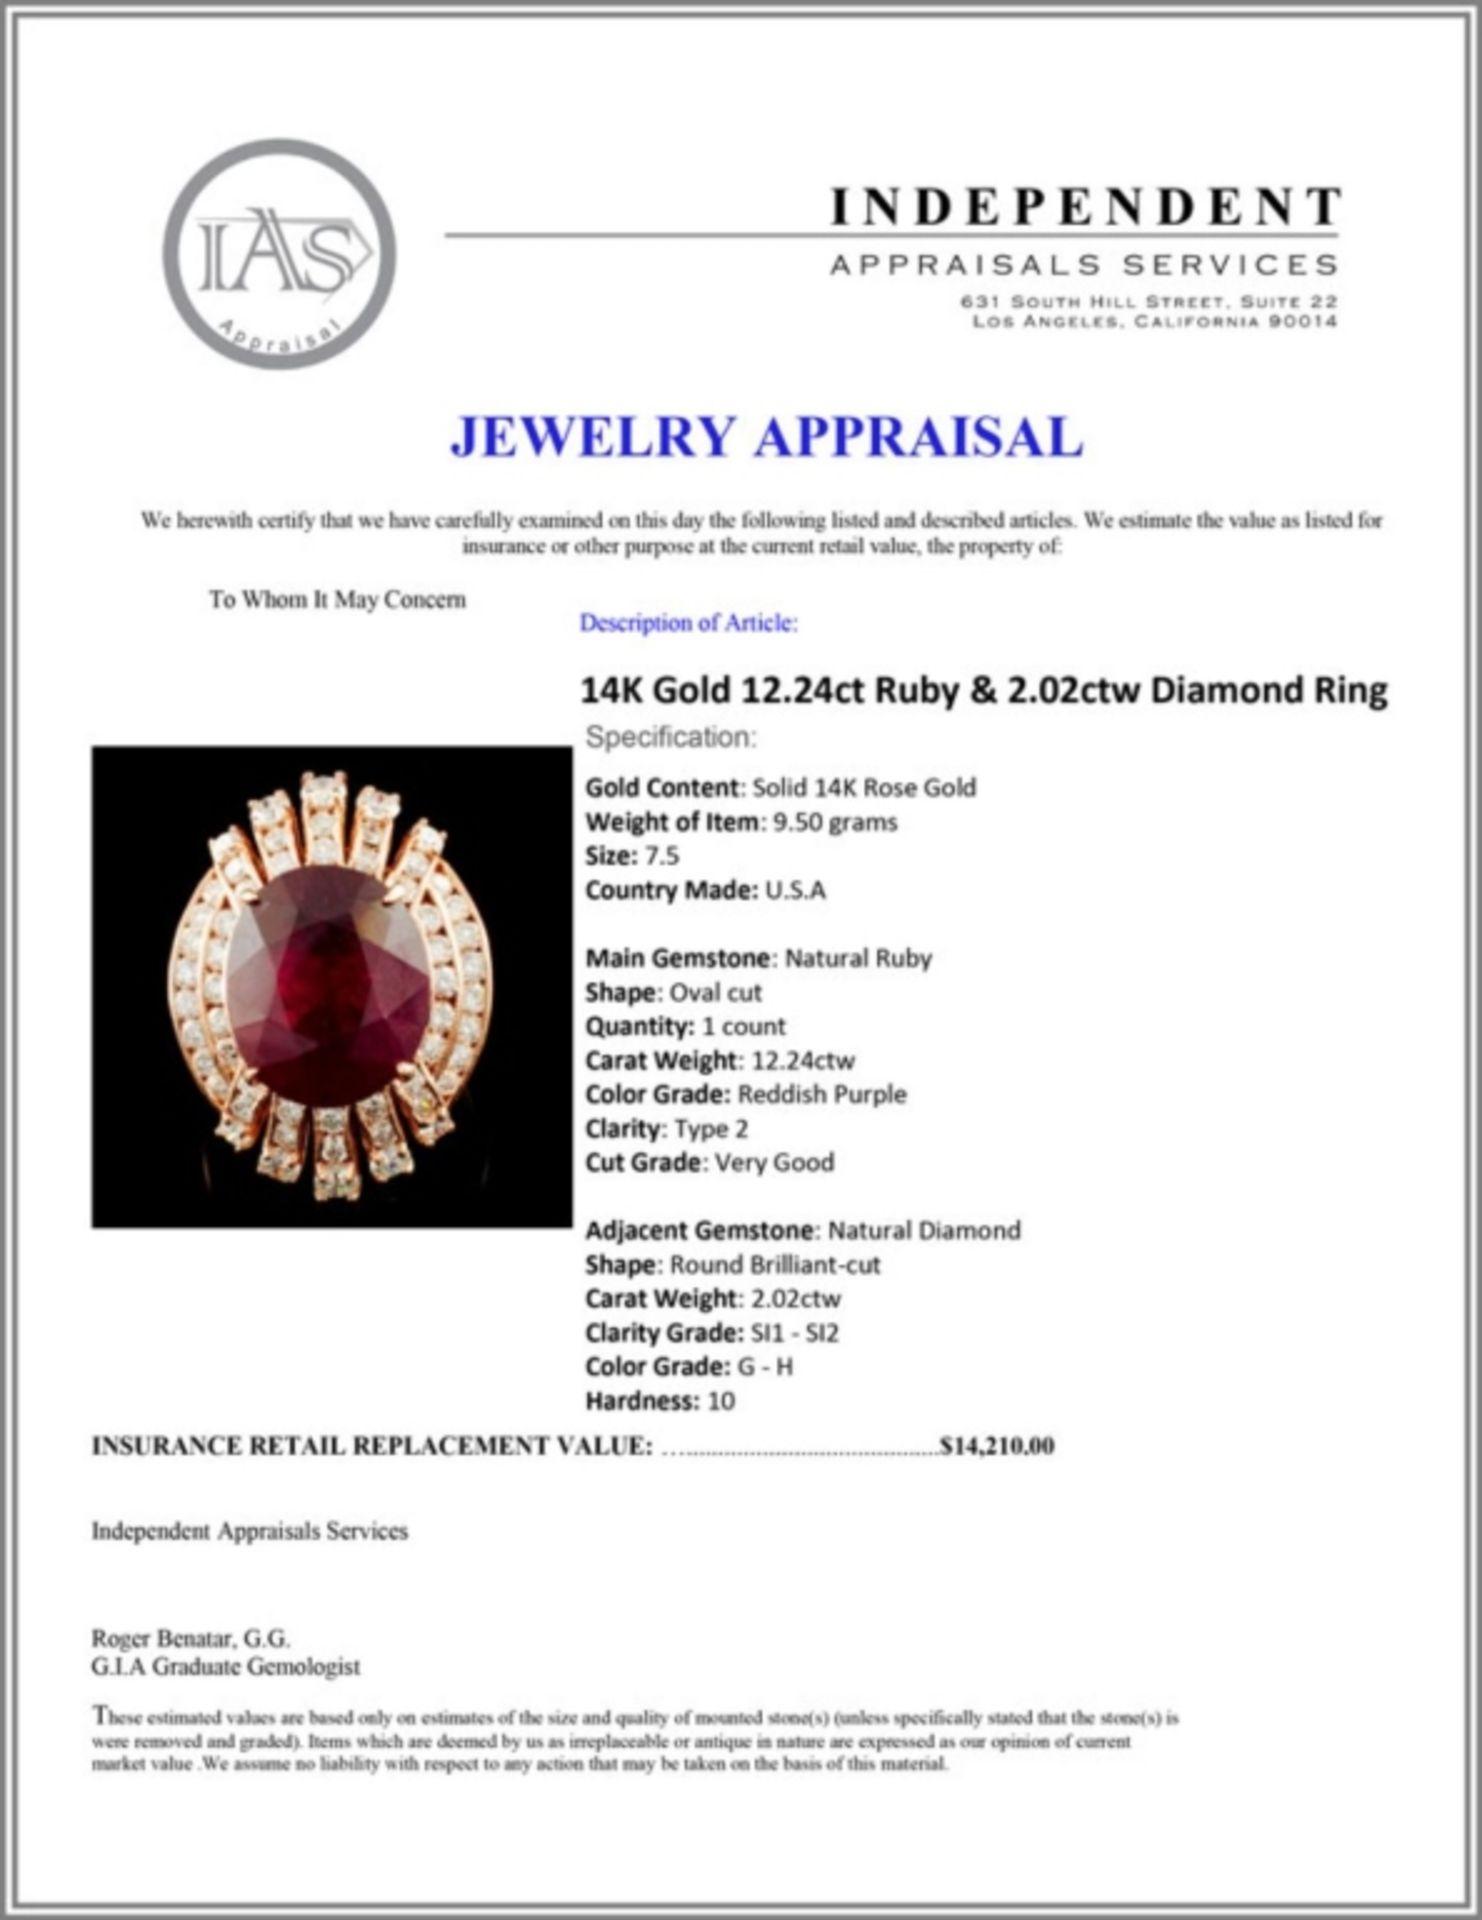 14K Gold 12.24ct Ruby & 2.02ctw Diamond Ring - Image 5 of 5